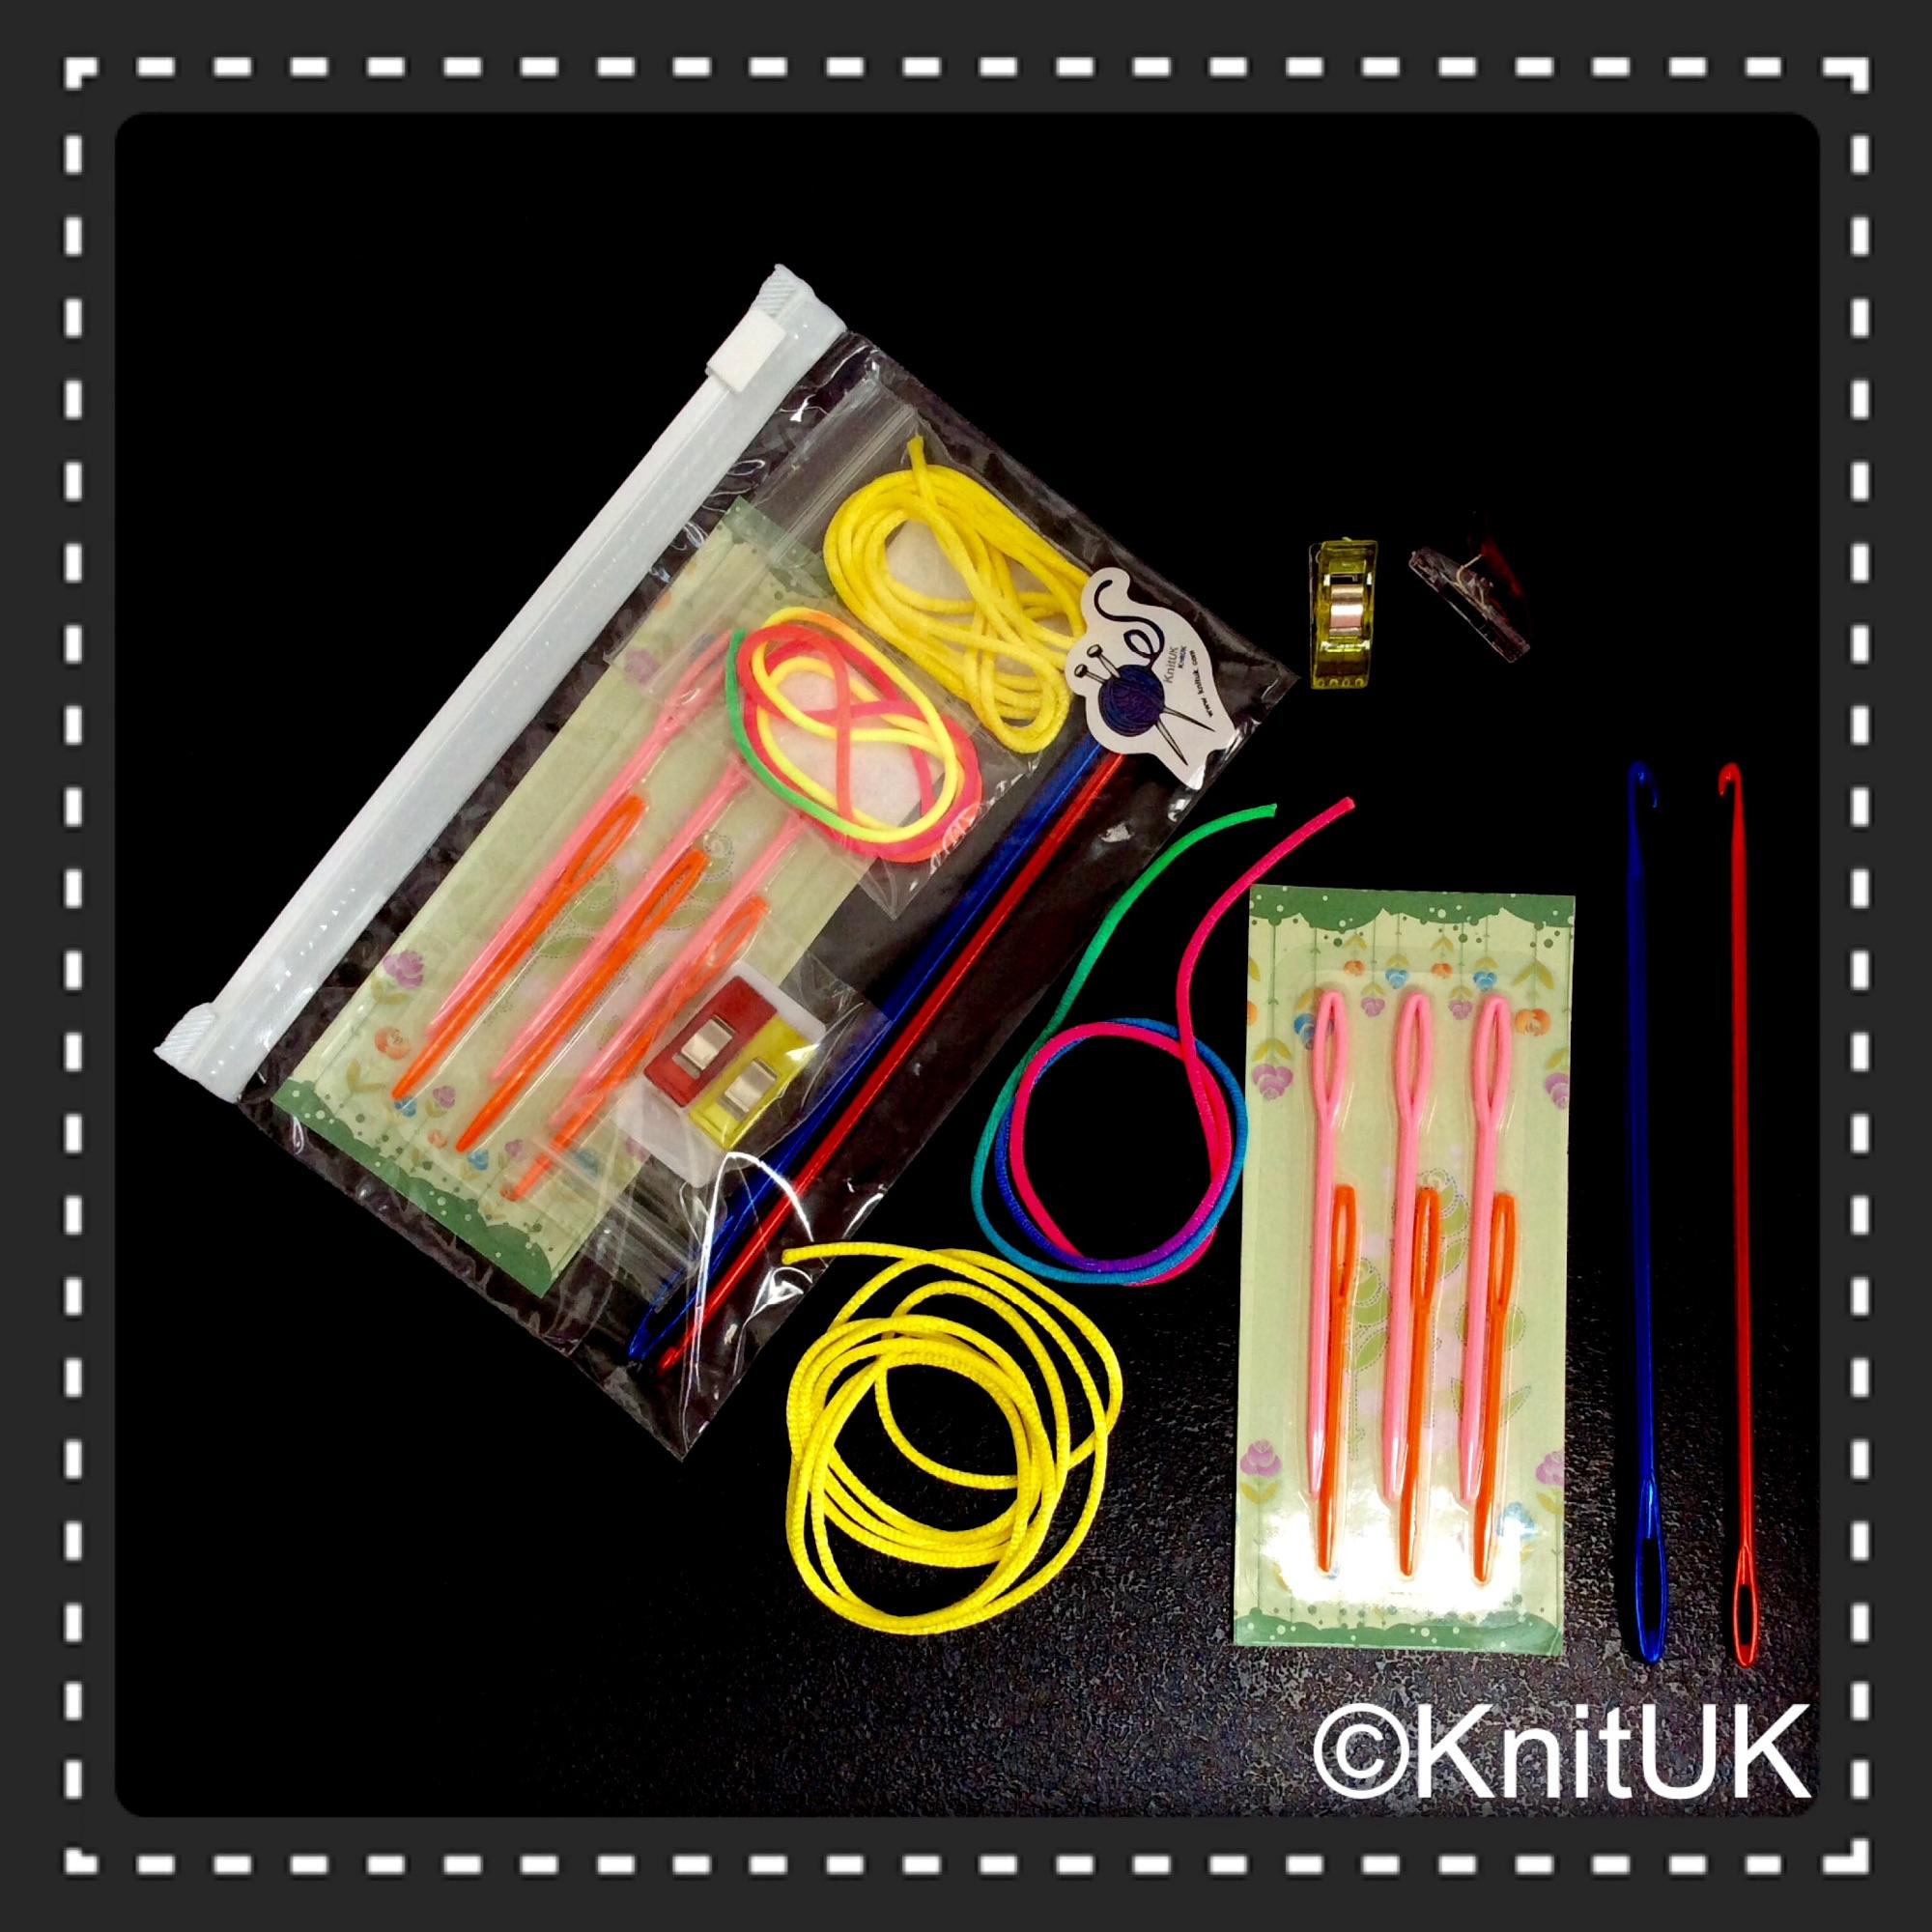 KnitUK Knook Set and items